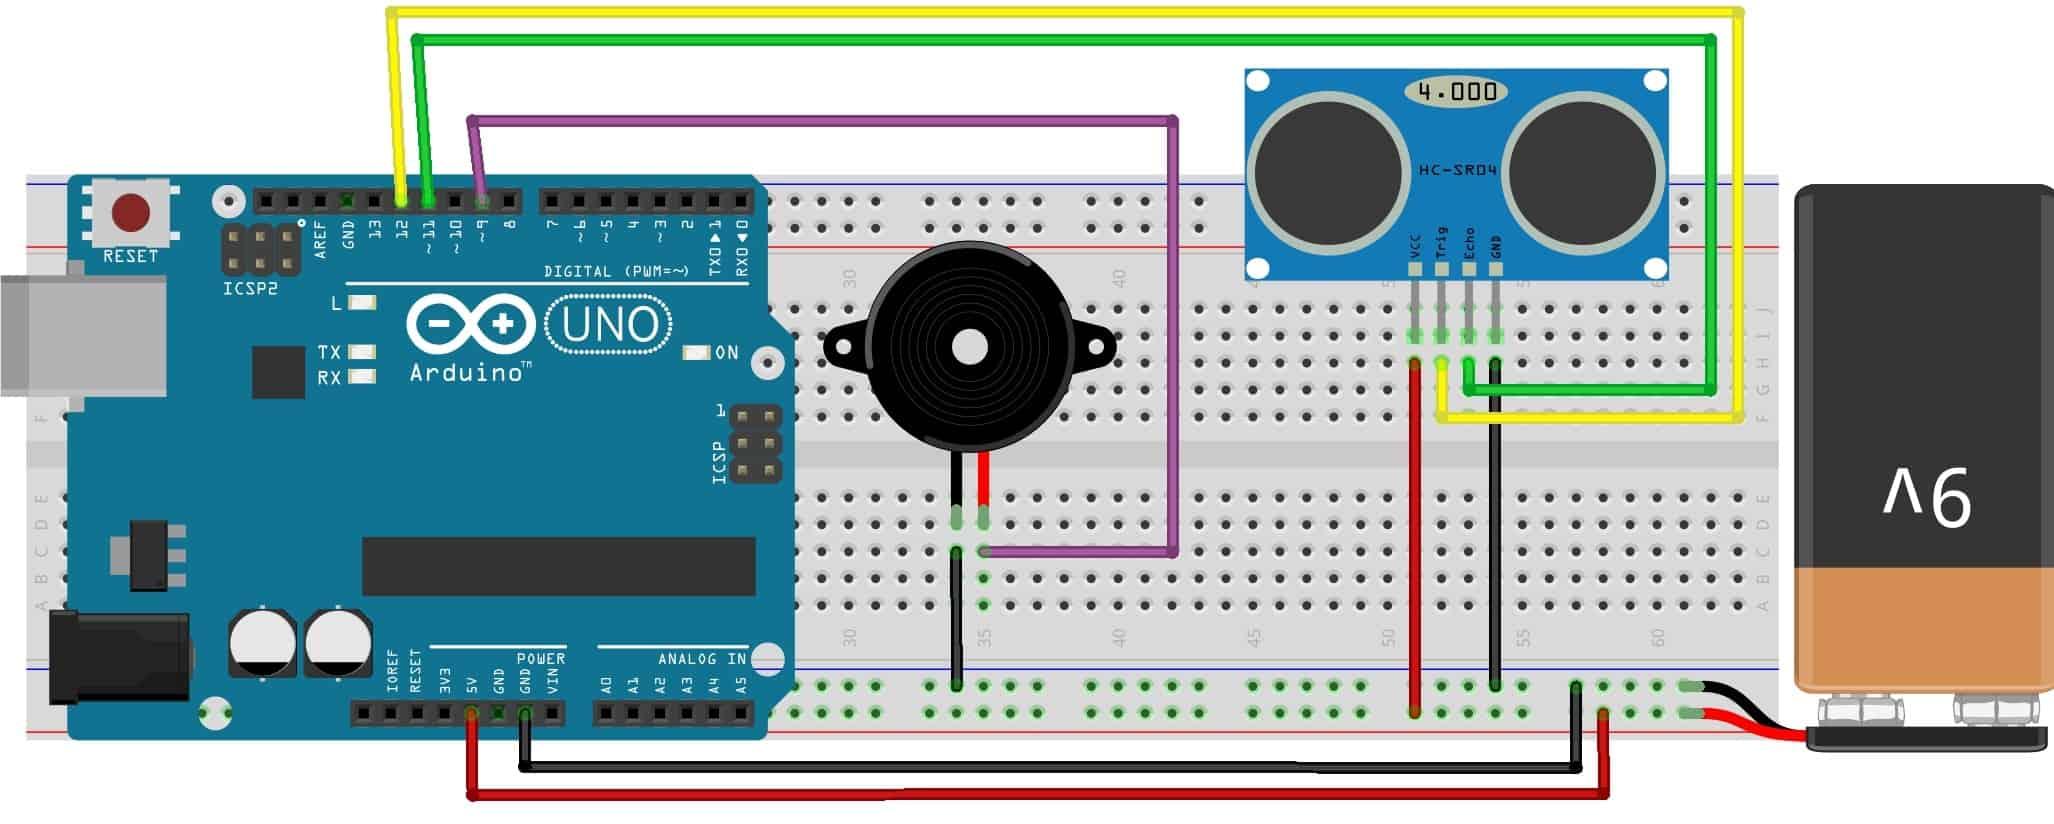 Blind Walking Stick Using Arduino & Ultrasonic Sensor HC-SR04